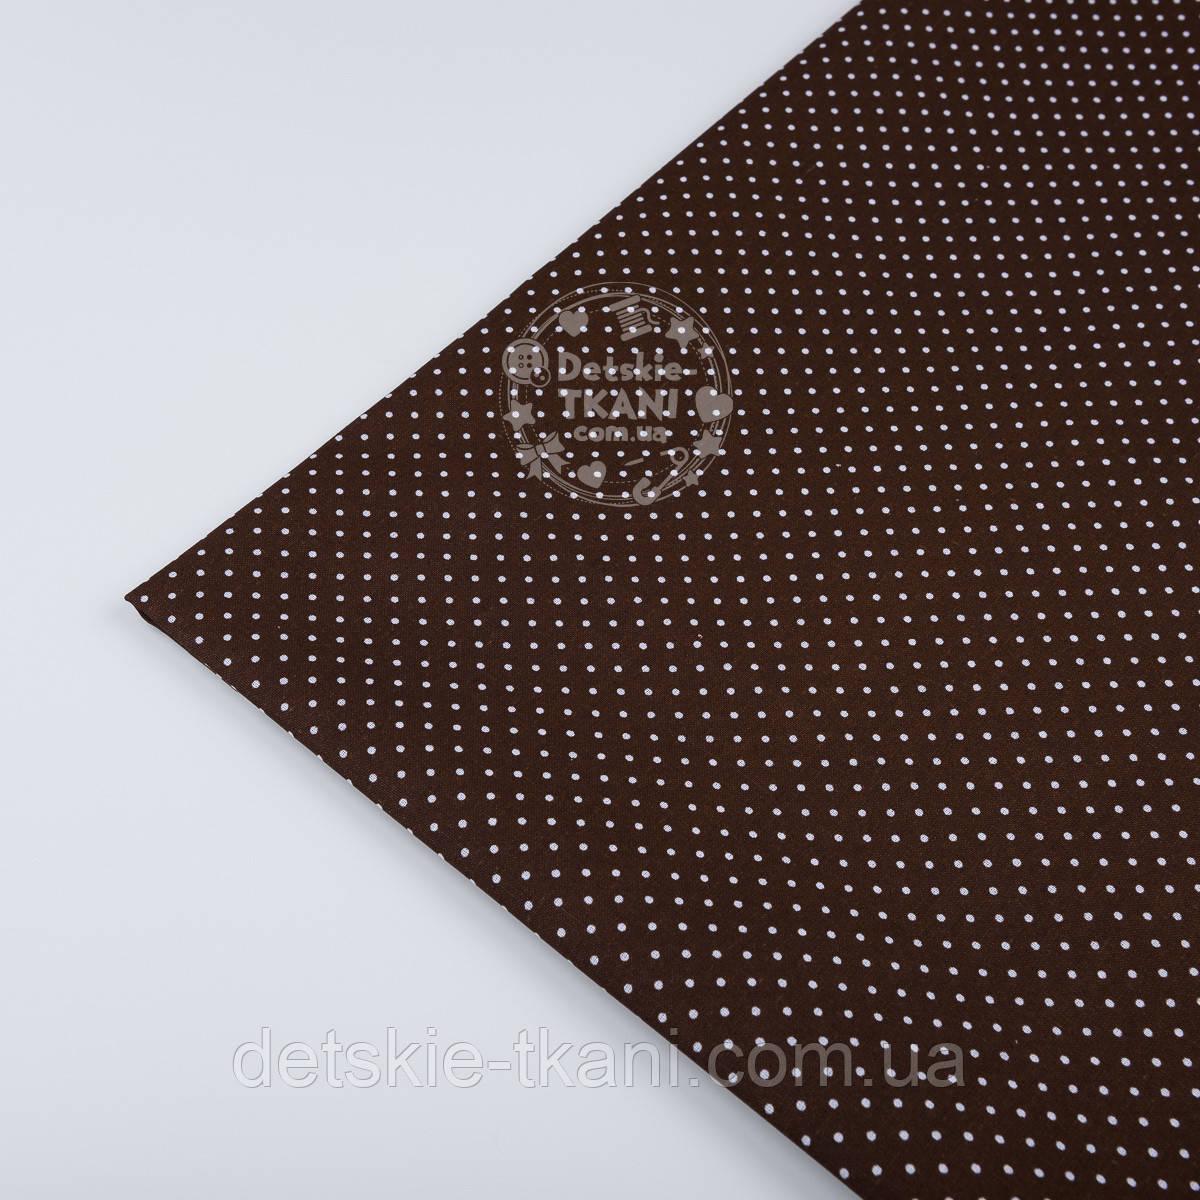 Лоскут ткани №310  с белыми точками на коричневом фоне